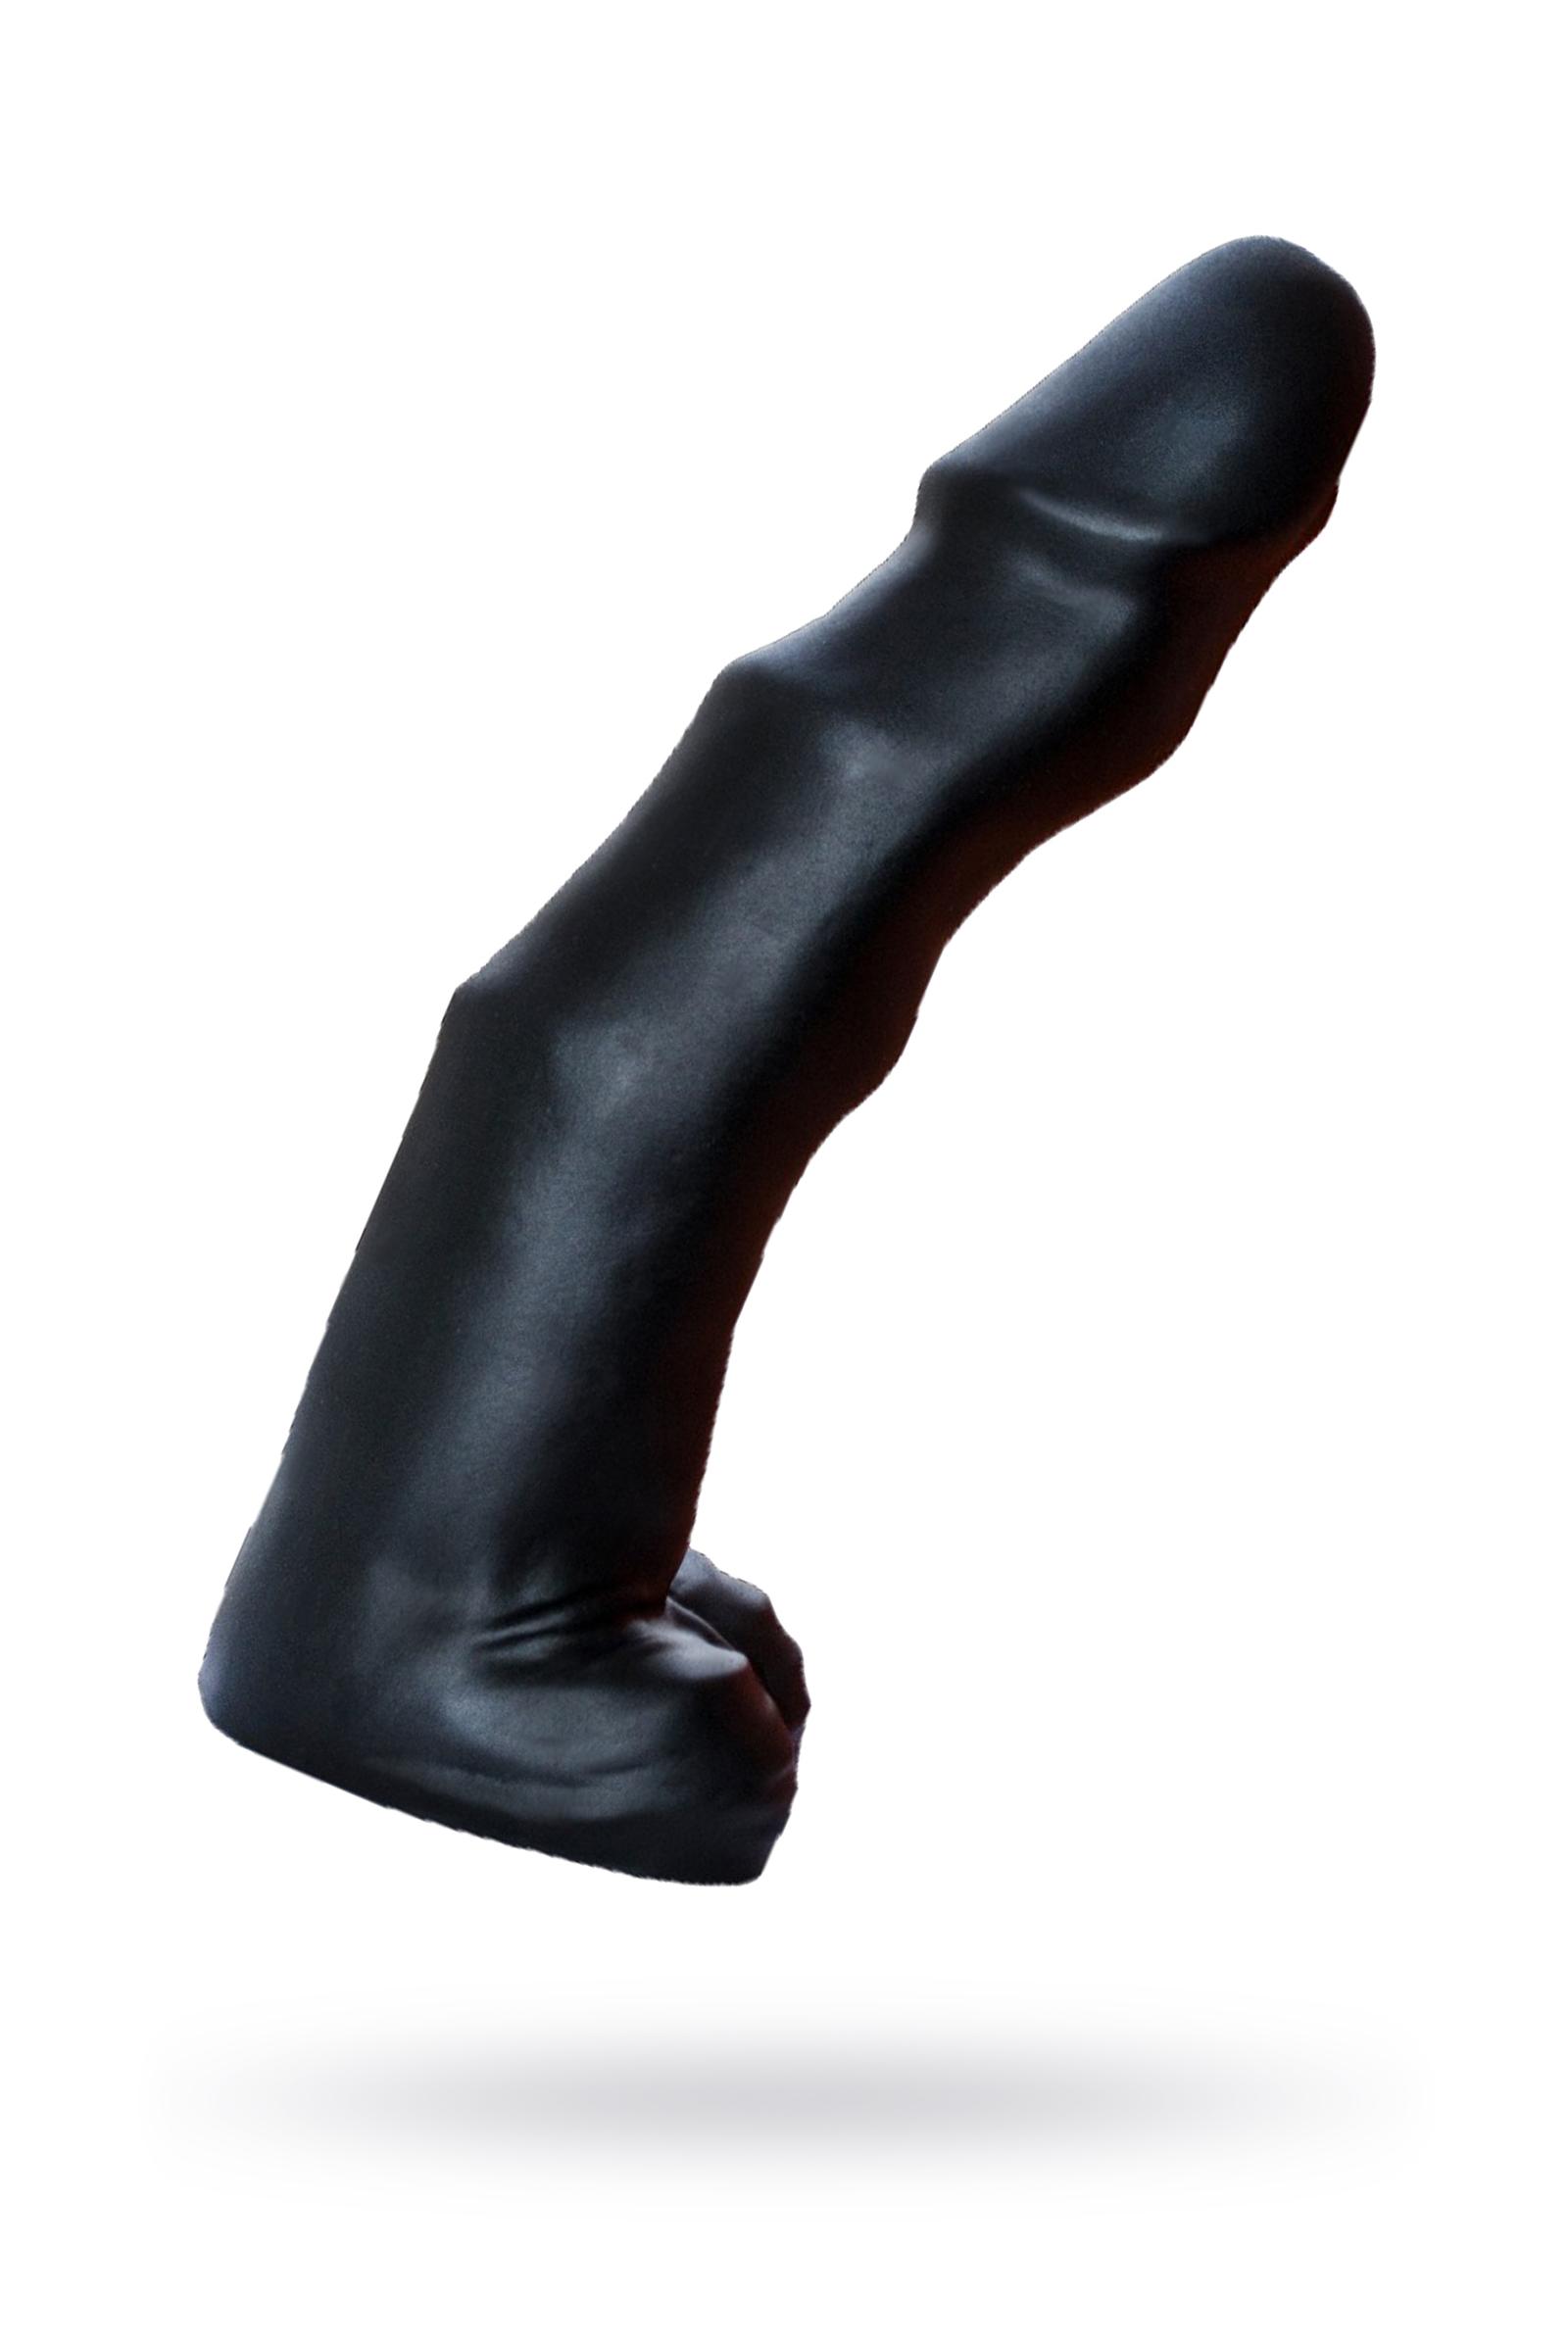 Фаллоимитатор-супергигант TYRANT Lovetoy, ПВХ, черный 36 см